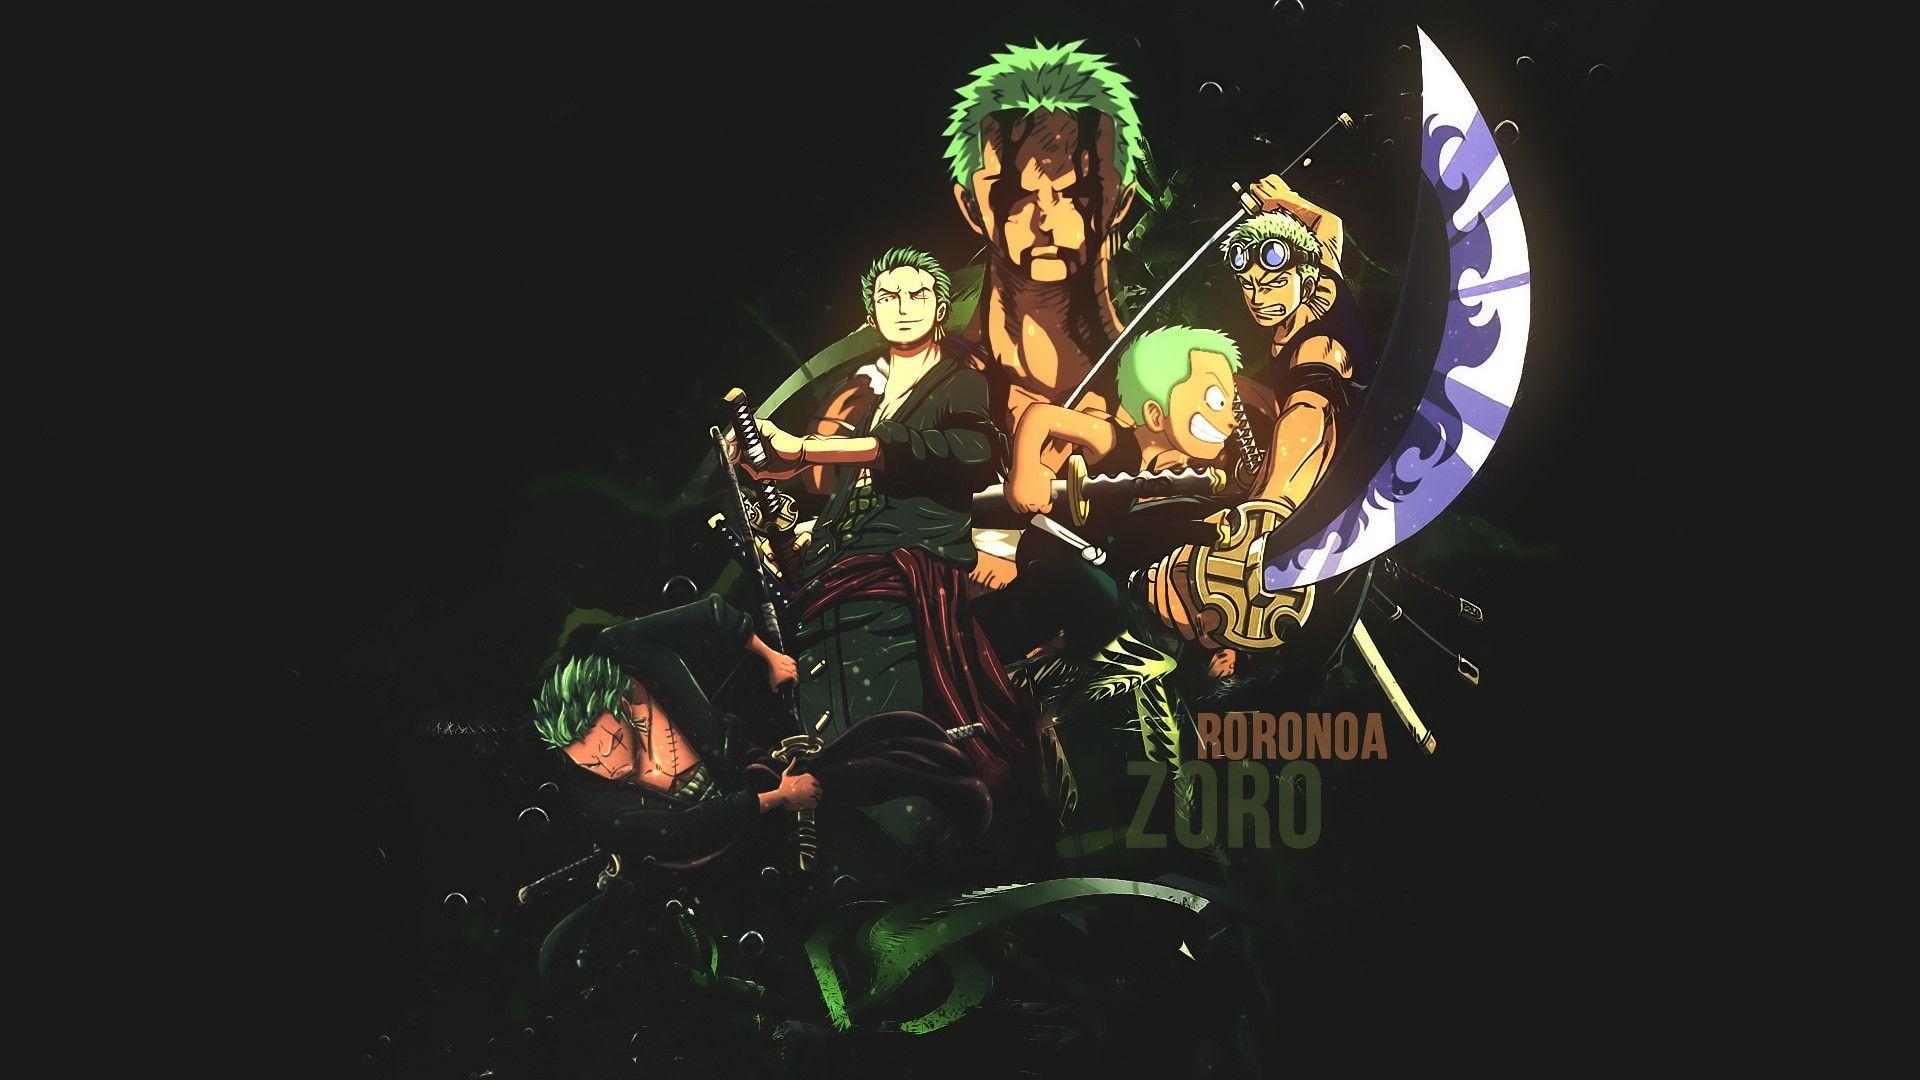 Desktop And Mobile Wallpaper Hd Anime Wallpapers Anime Wallpaper Roronoa Zoro